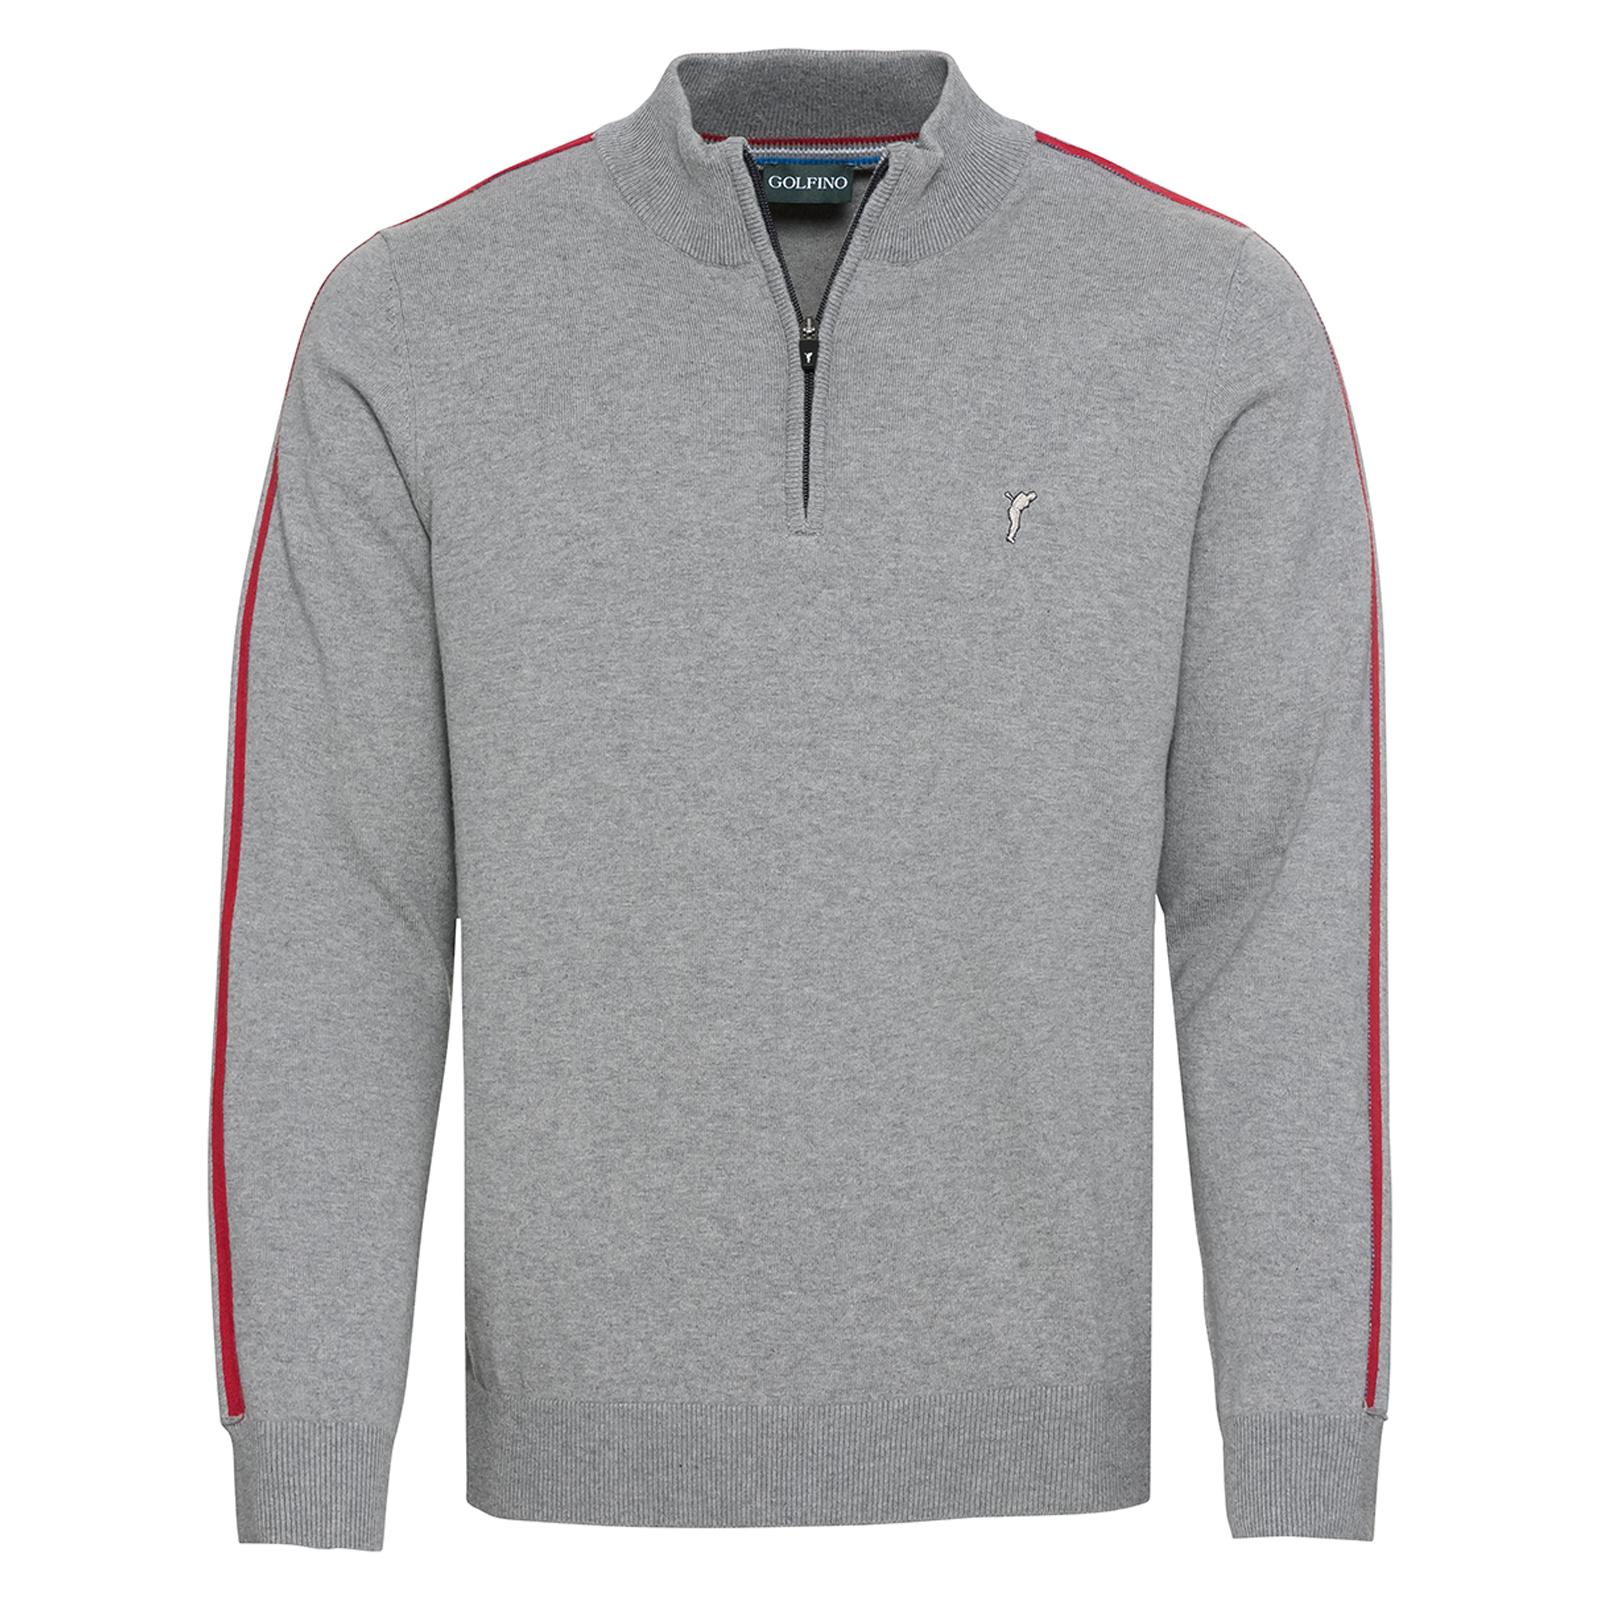 Komfortabler Herren Merino Golf Sweater